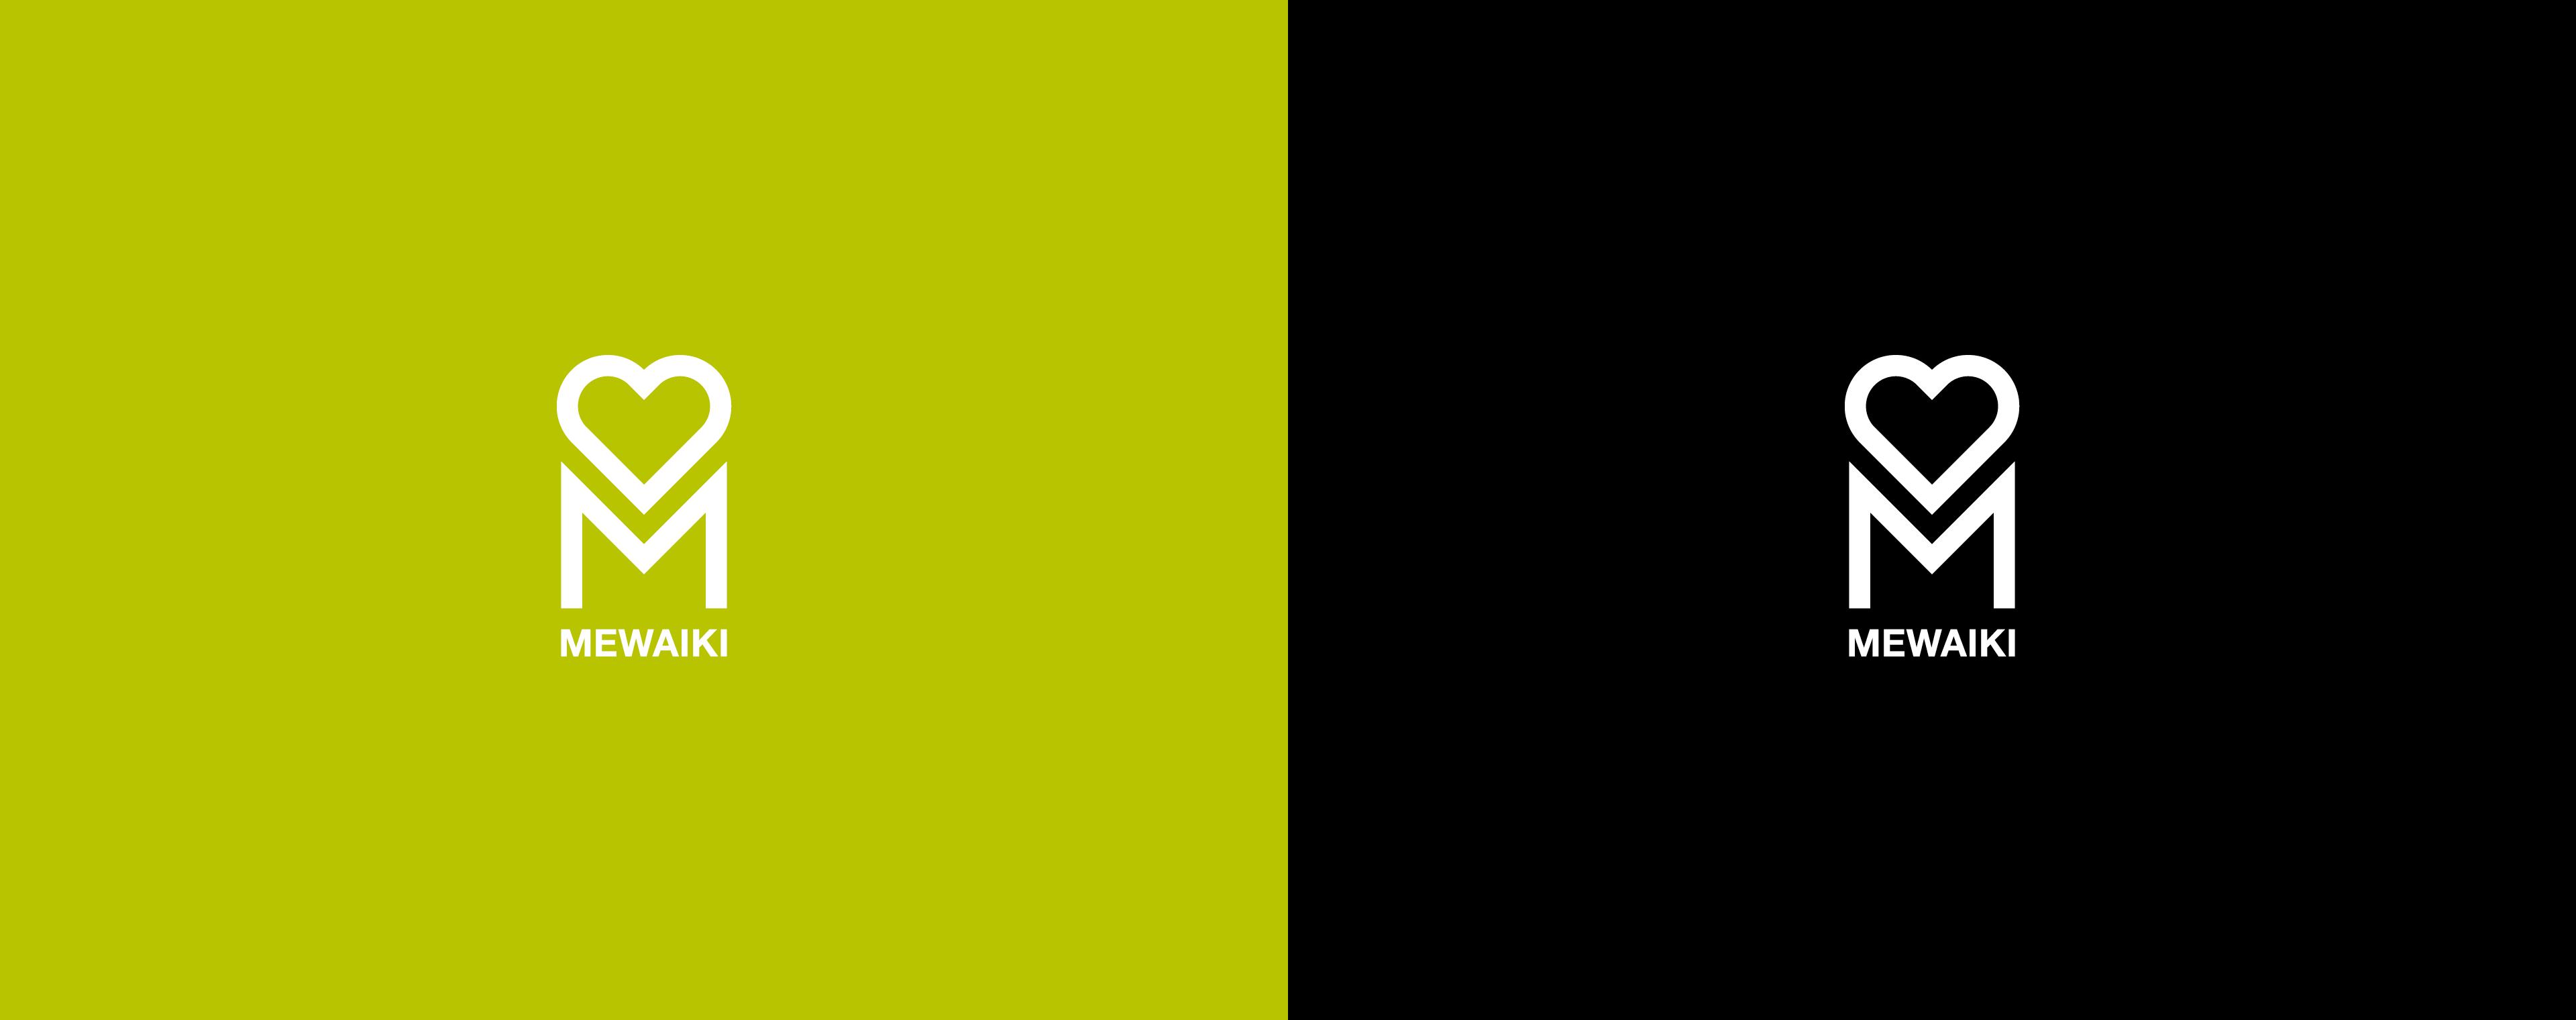 Logodesign für MEWAIKI e.V.